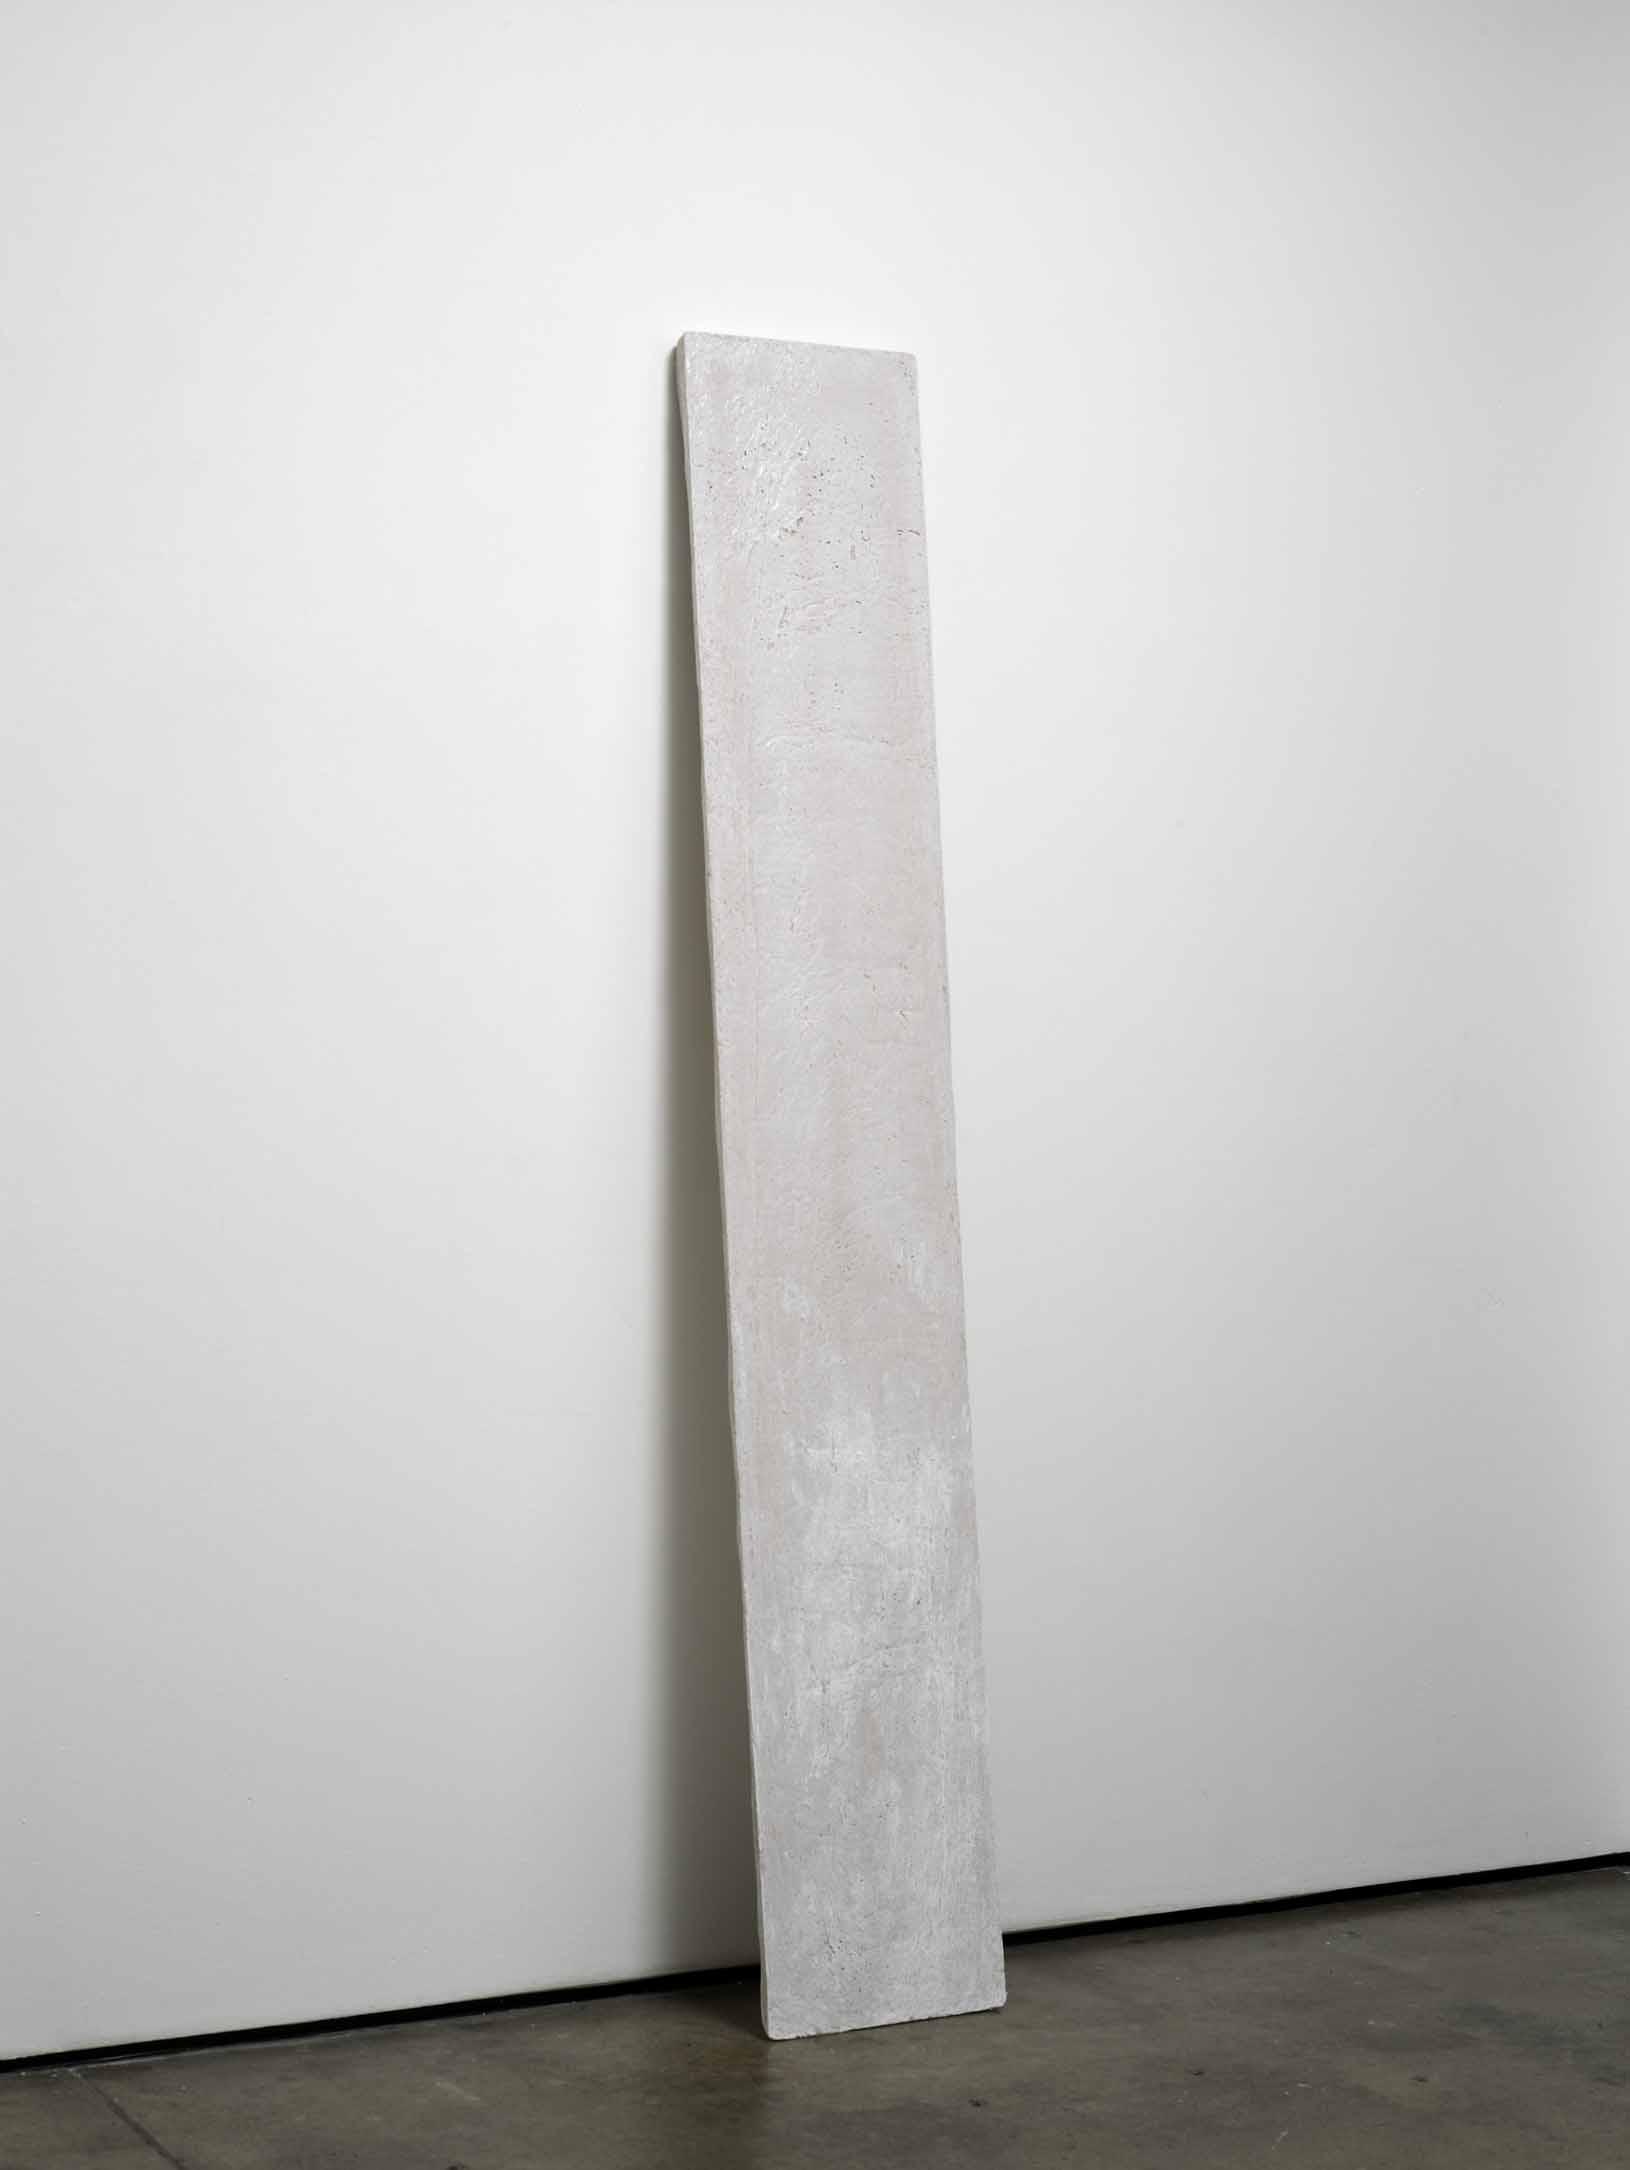 j (working title)    2011    Concrete    200 x 32 x 2.5 cm / 78.7 x 12.5 x 1 in